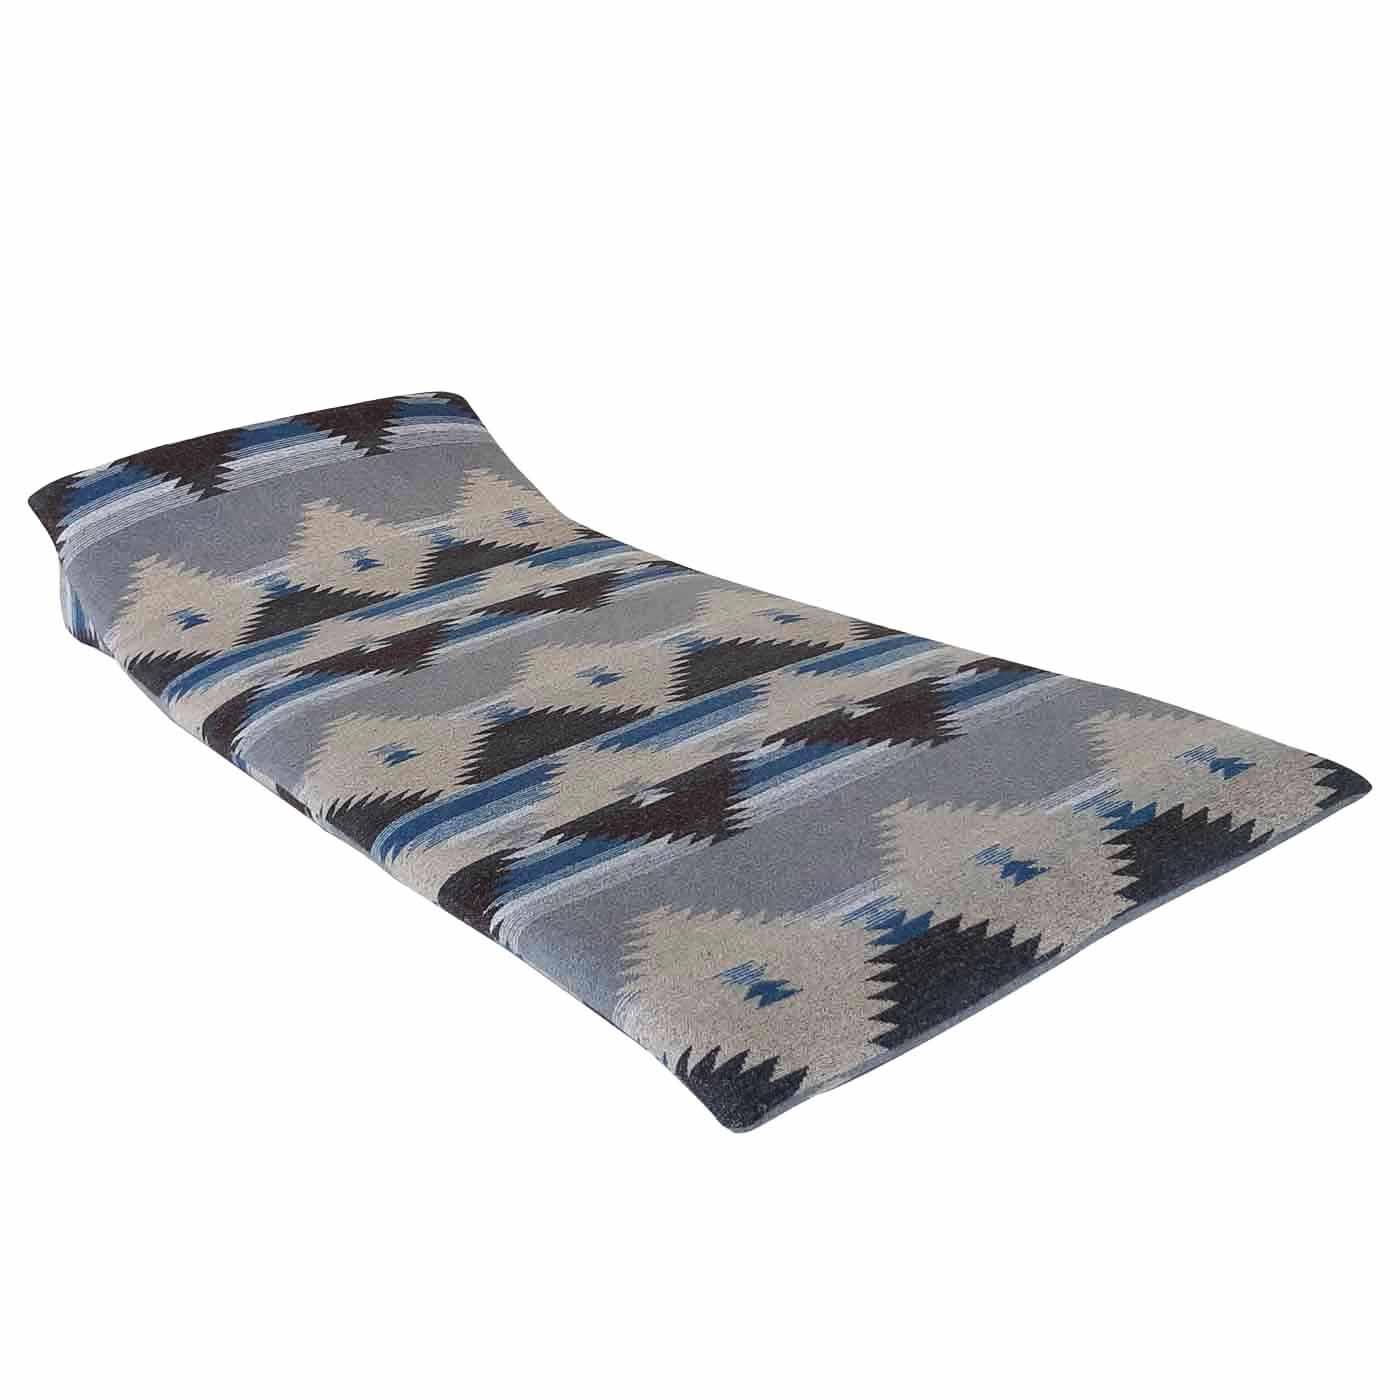 Nador Blue Patterned Floor Mattress